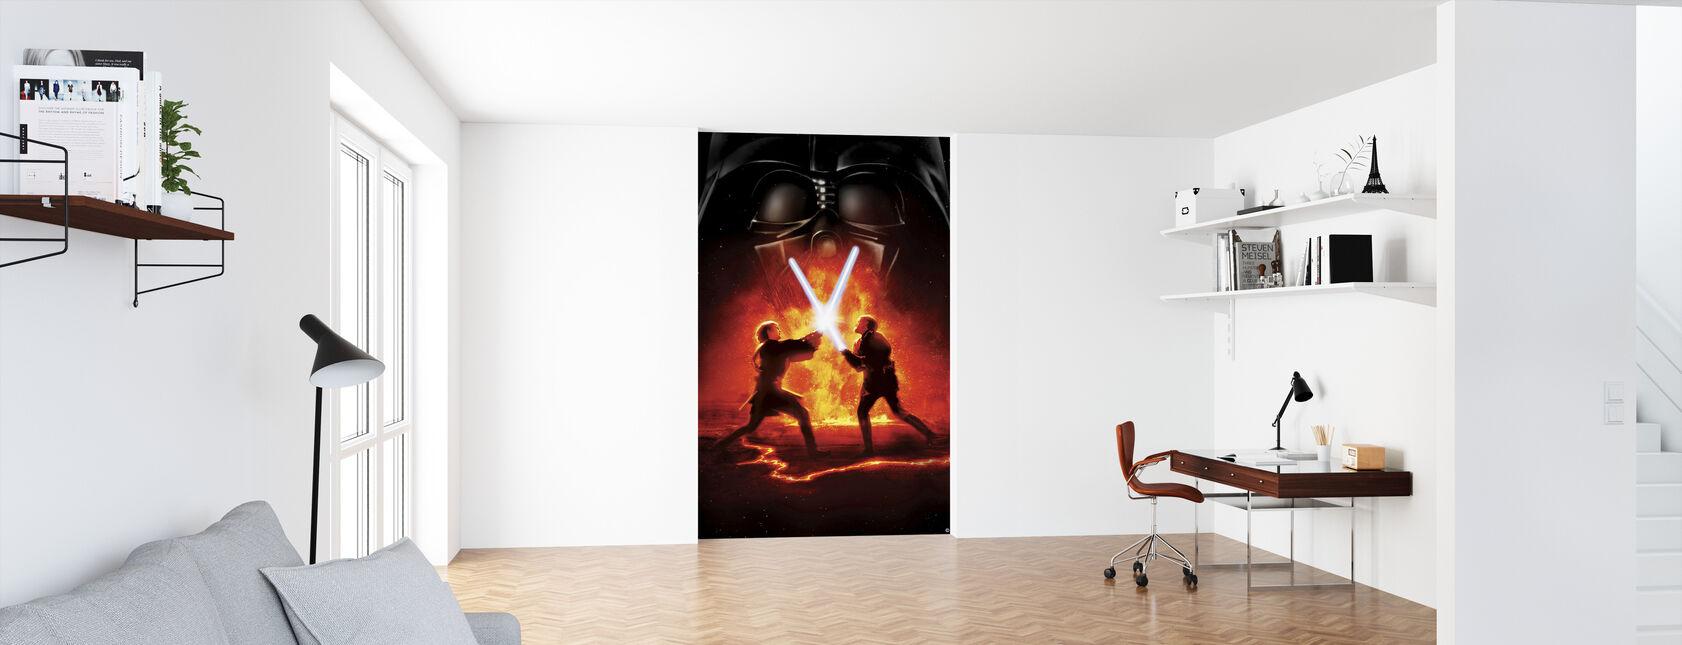 Star Wars - Lava kamp 2 - Tapet - Kontor